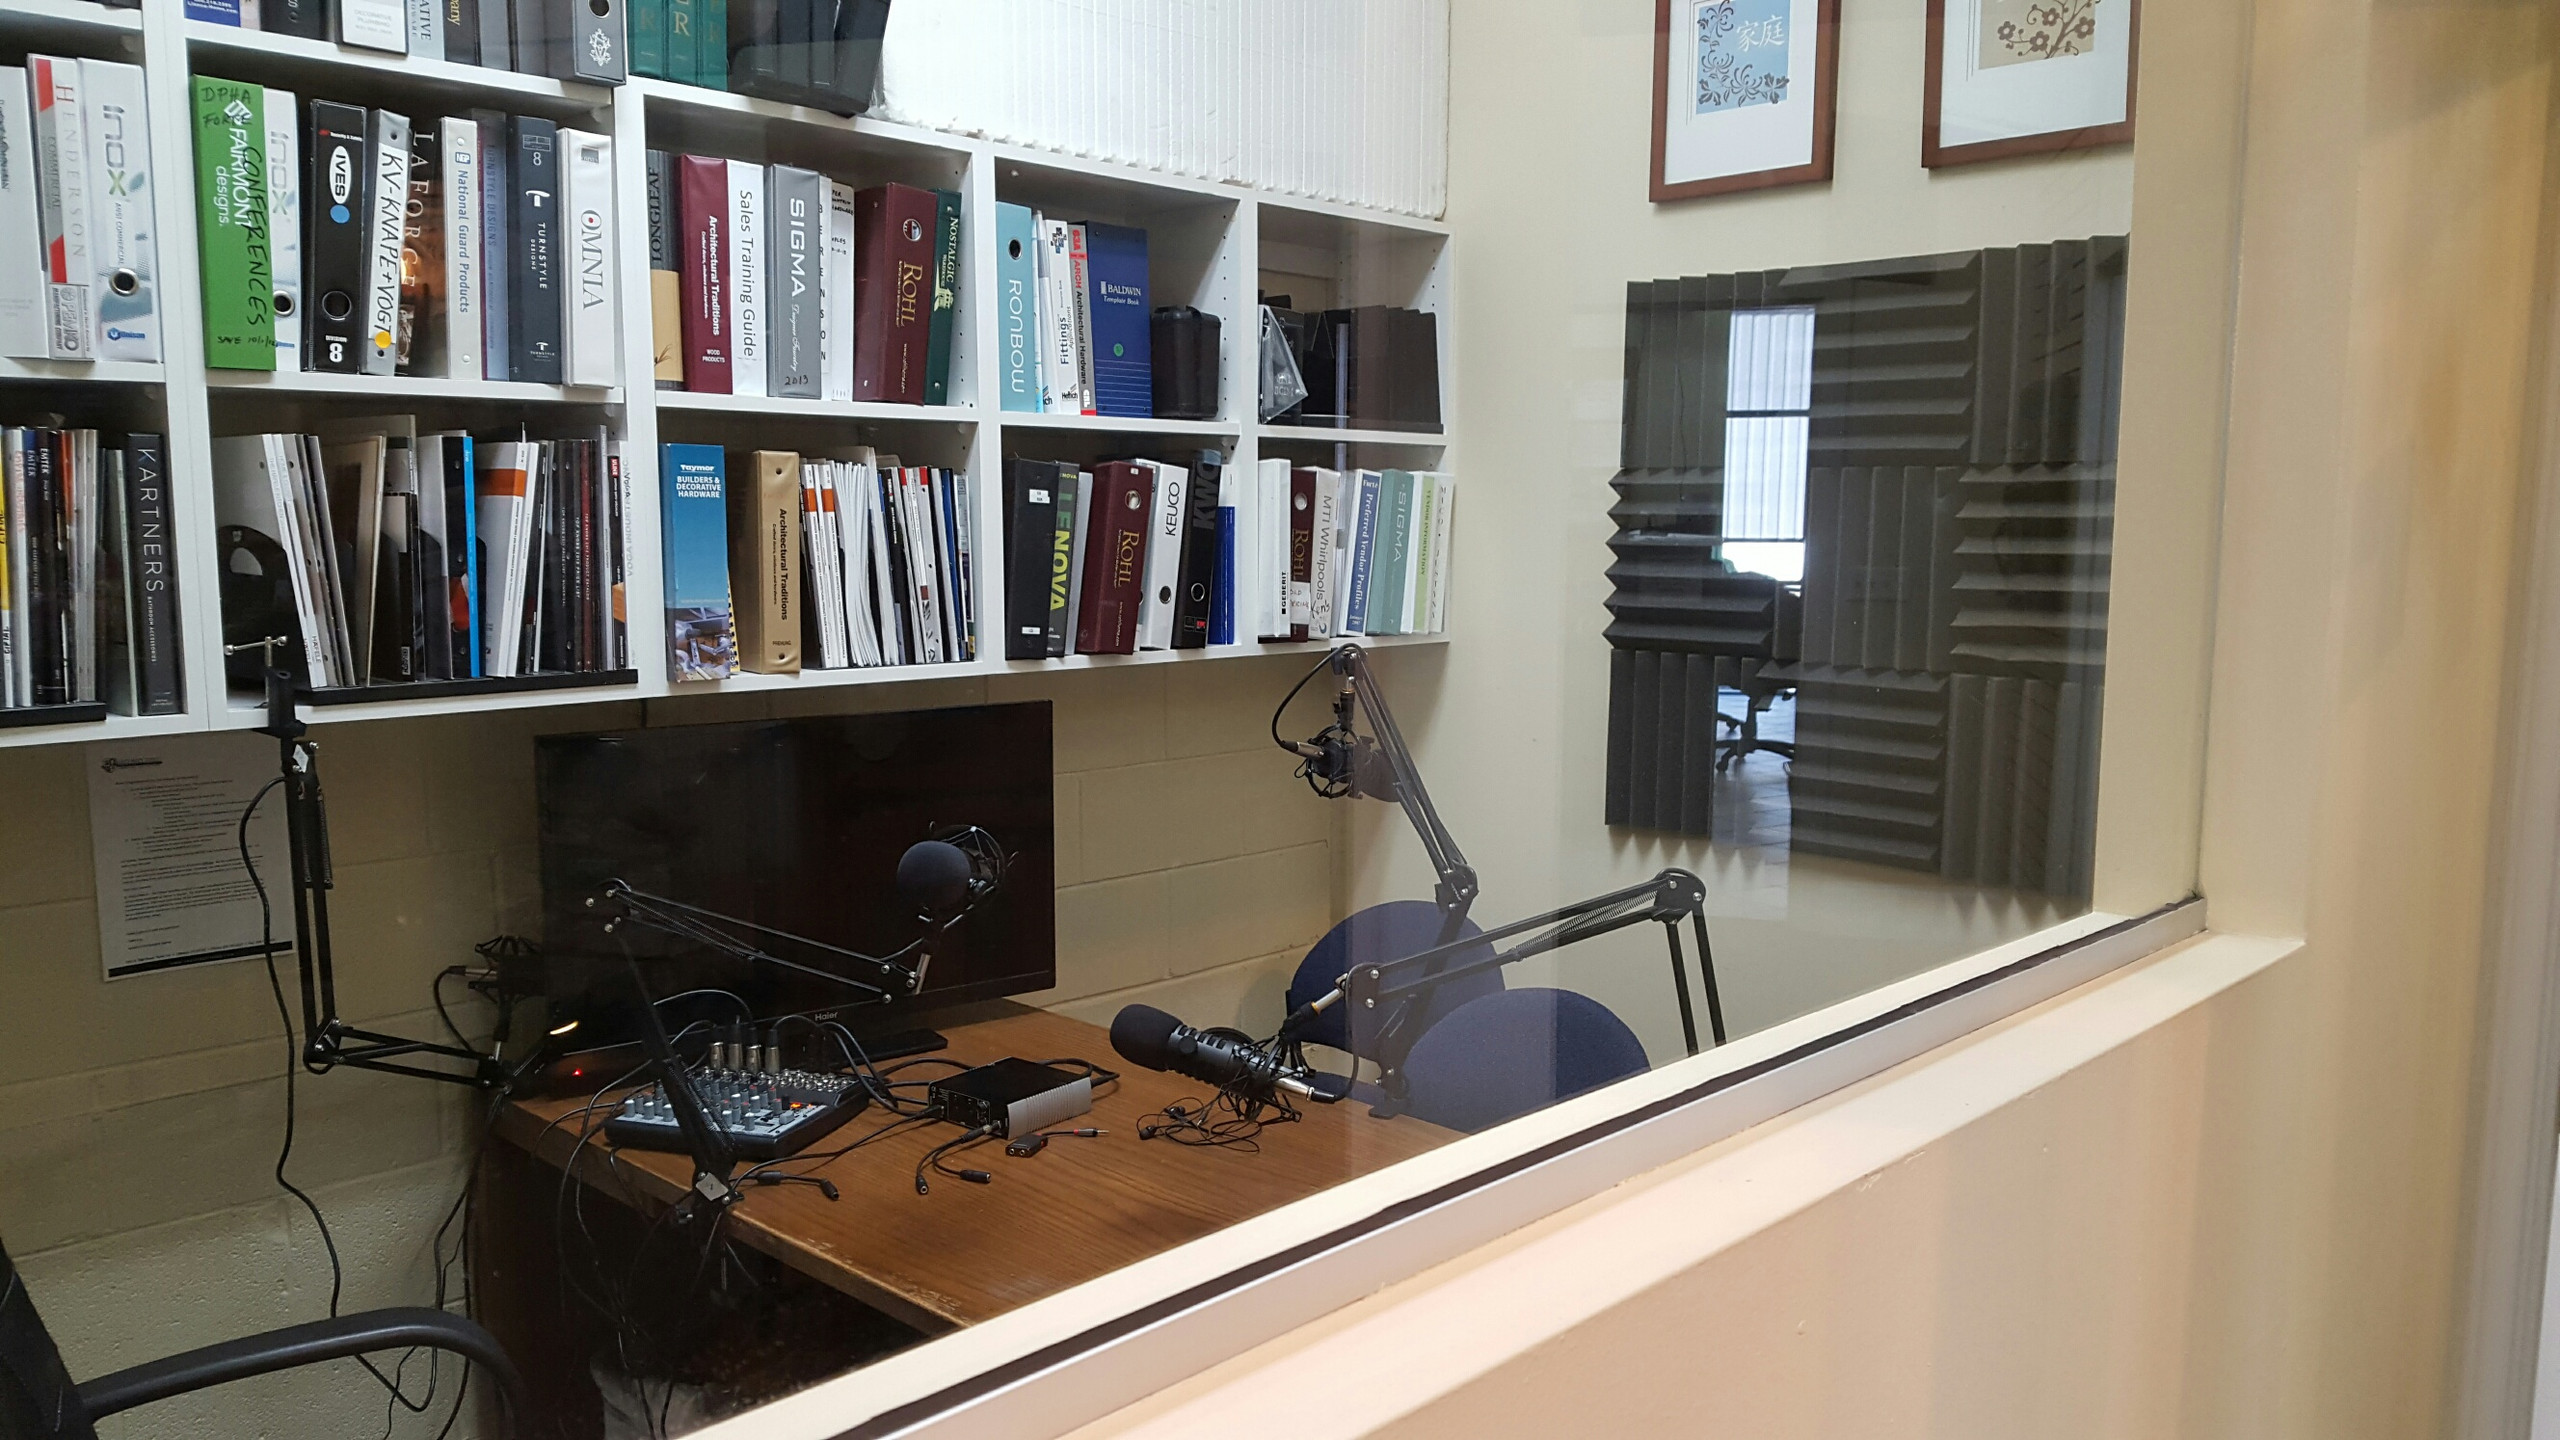 The NEW Art of Construction recording studio